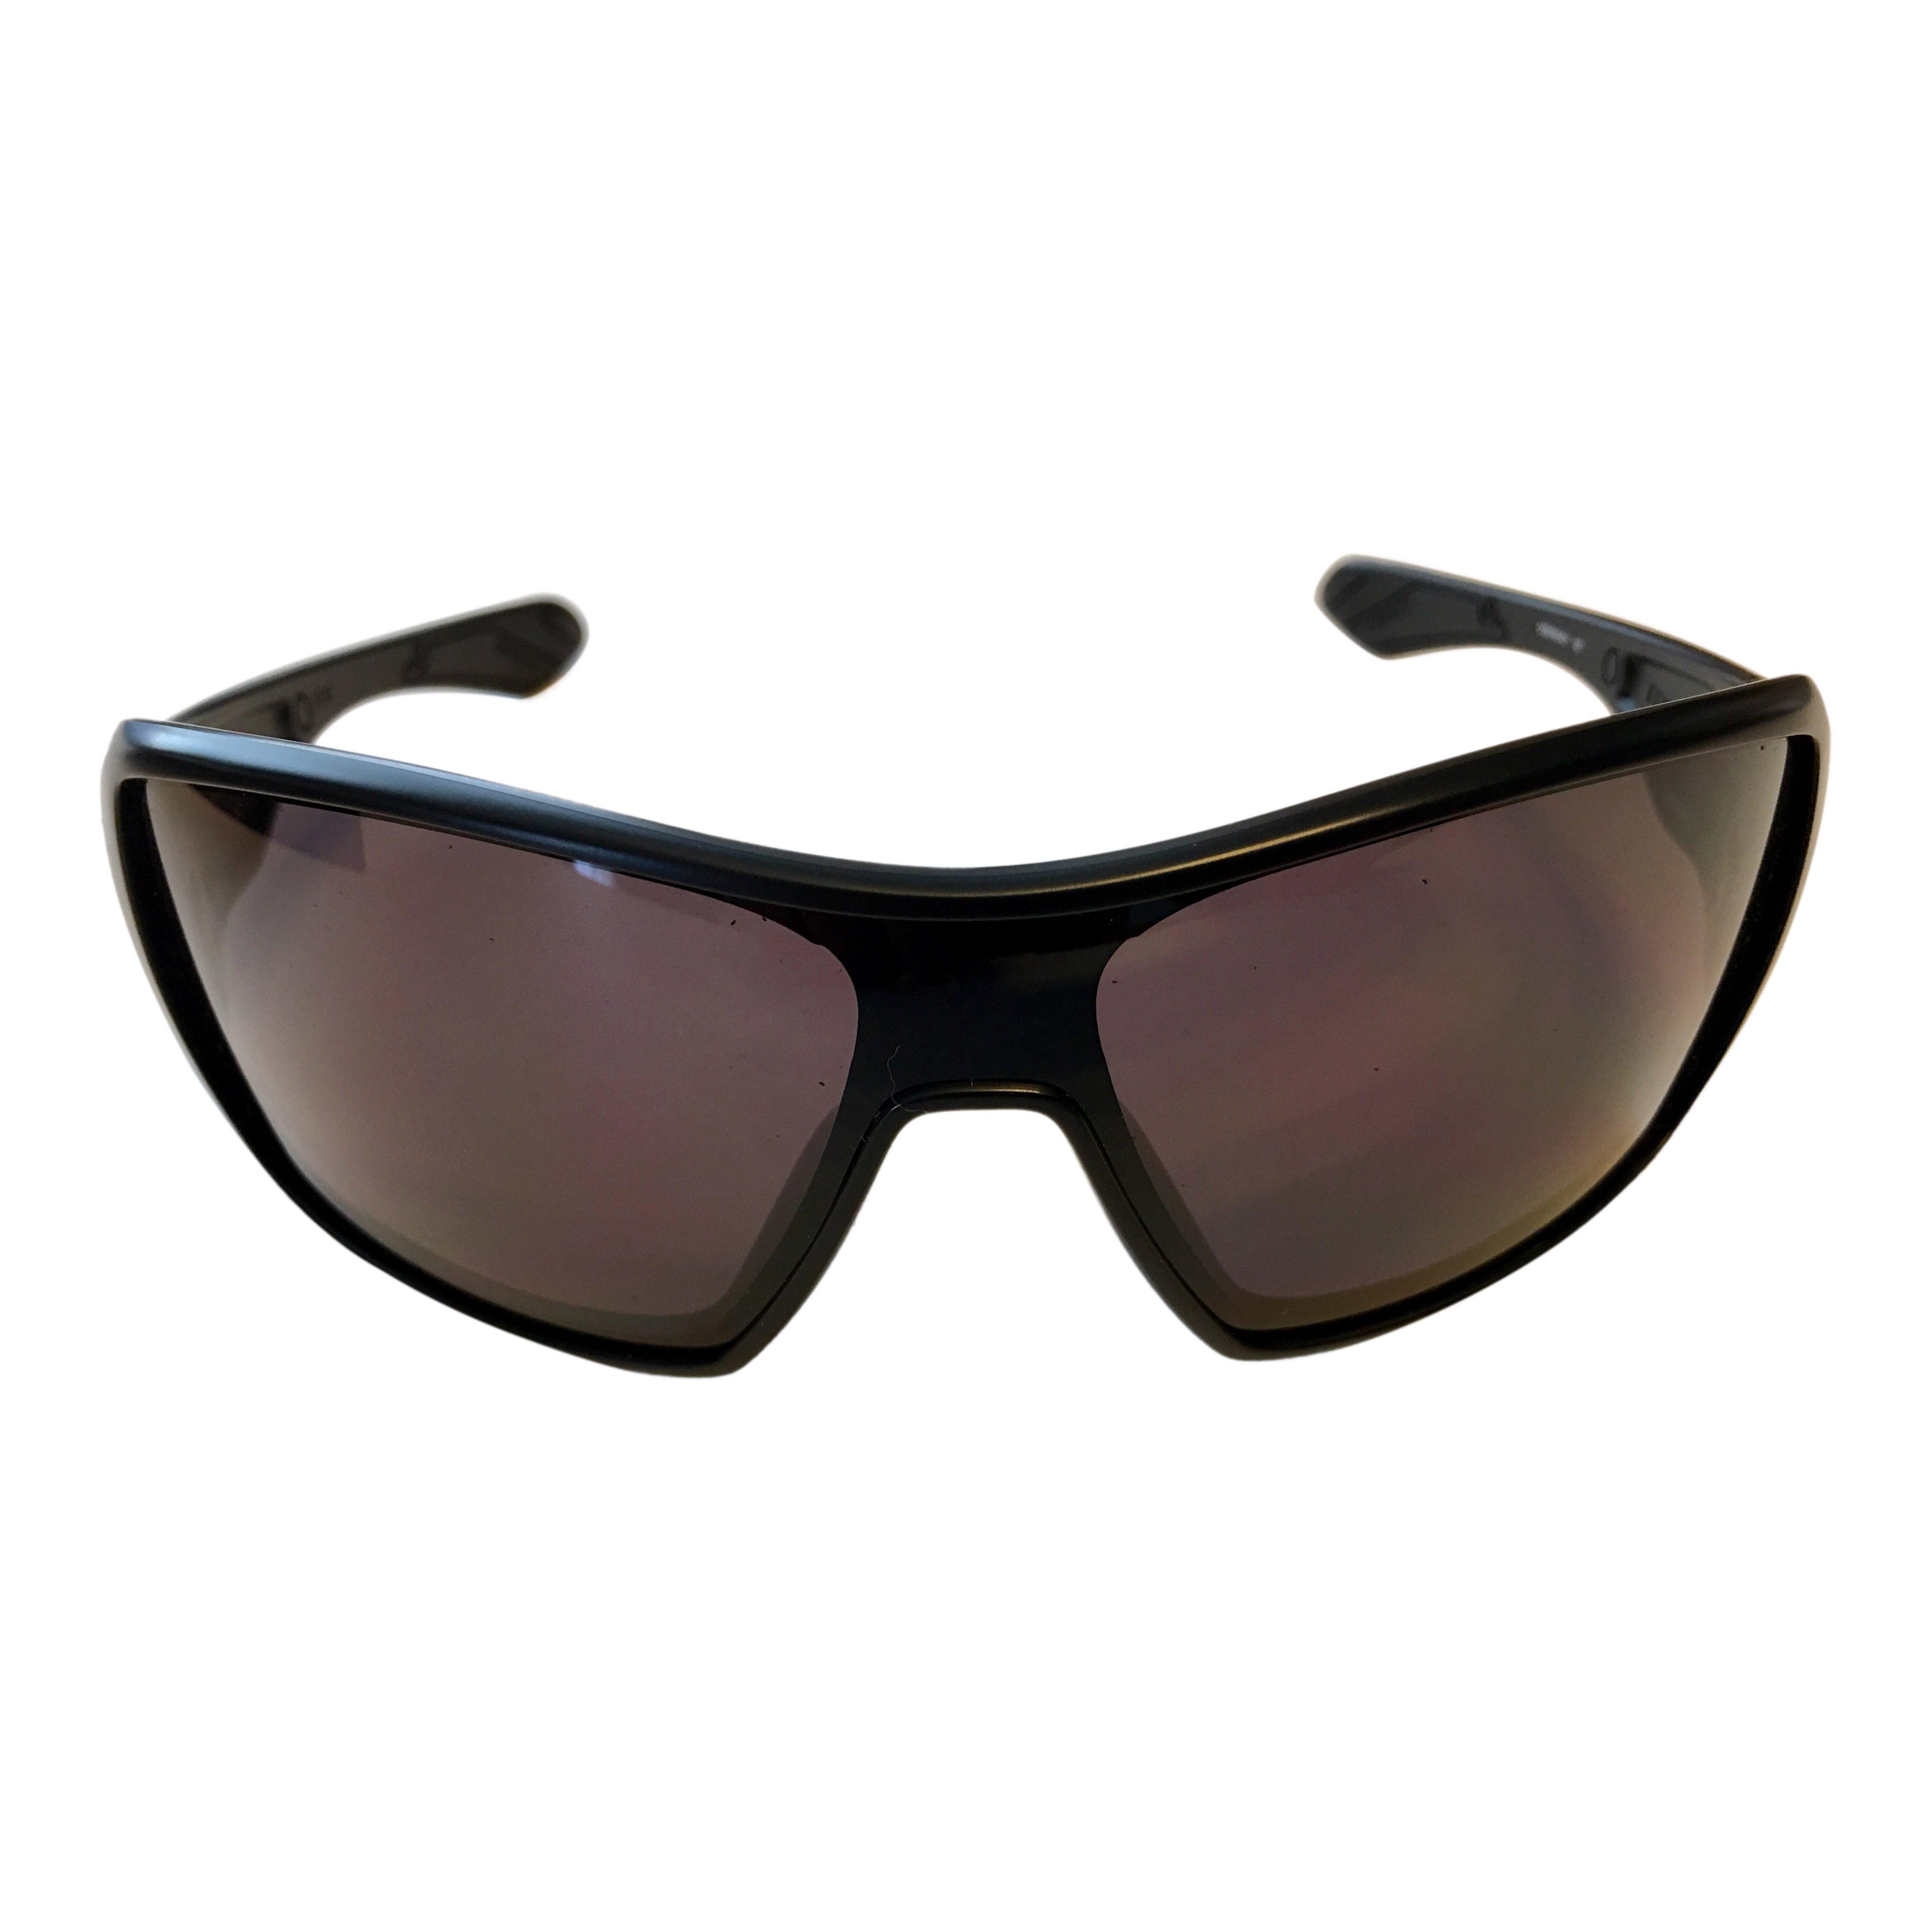 8cdd9f39297 Oakley Offshoot Sunglasses - Matte Black Frame - Warm Grey OO9190-01